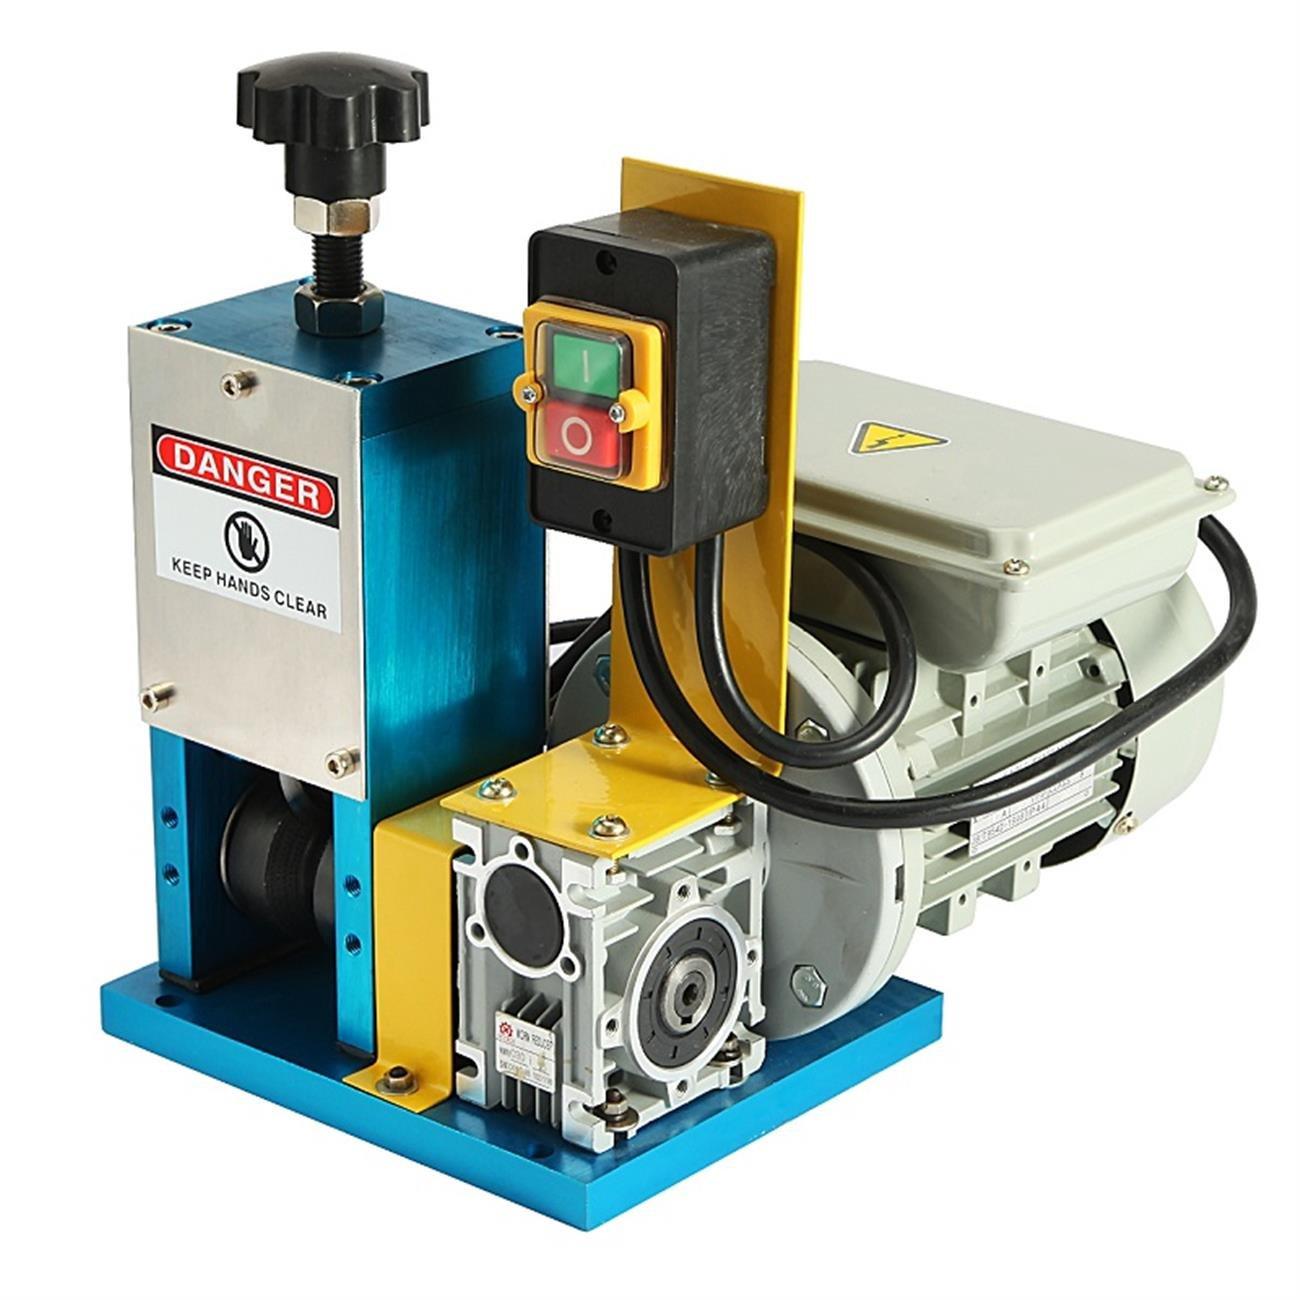 BEAMNOVA Automatic Wire Stripping Machine Electric Copper Stripper ...